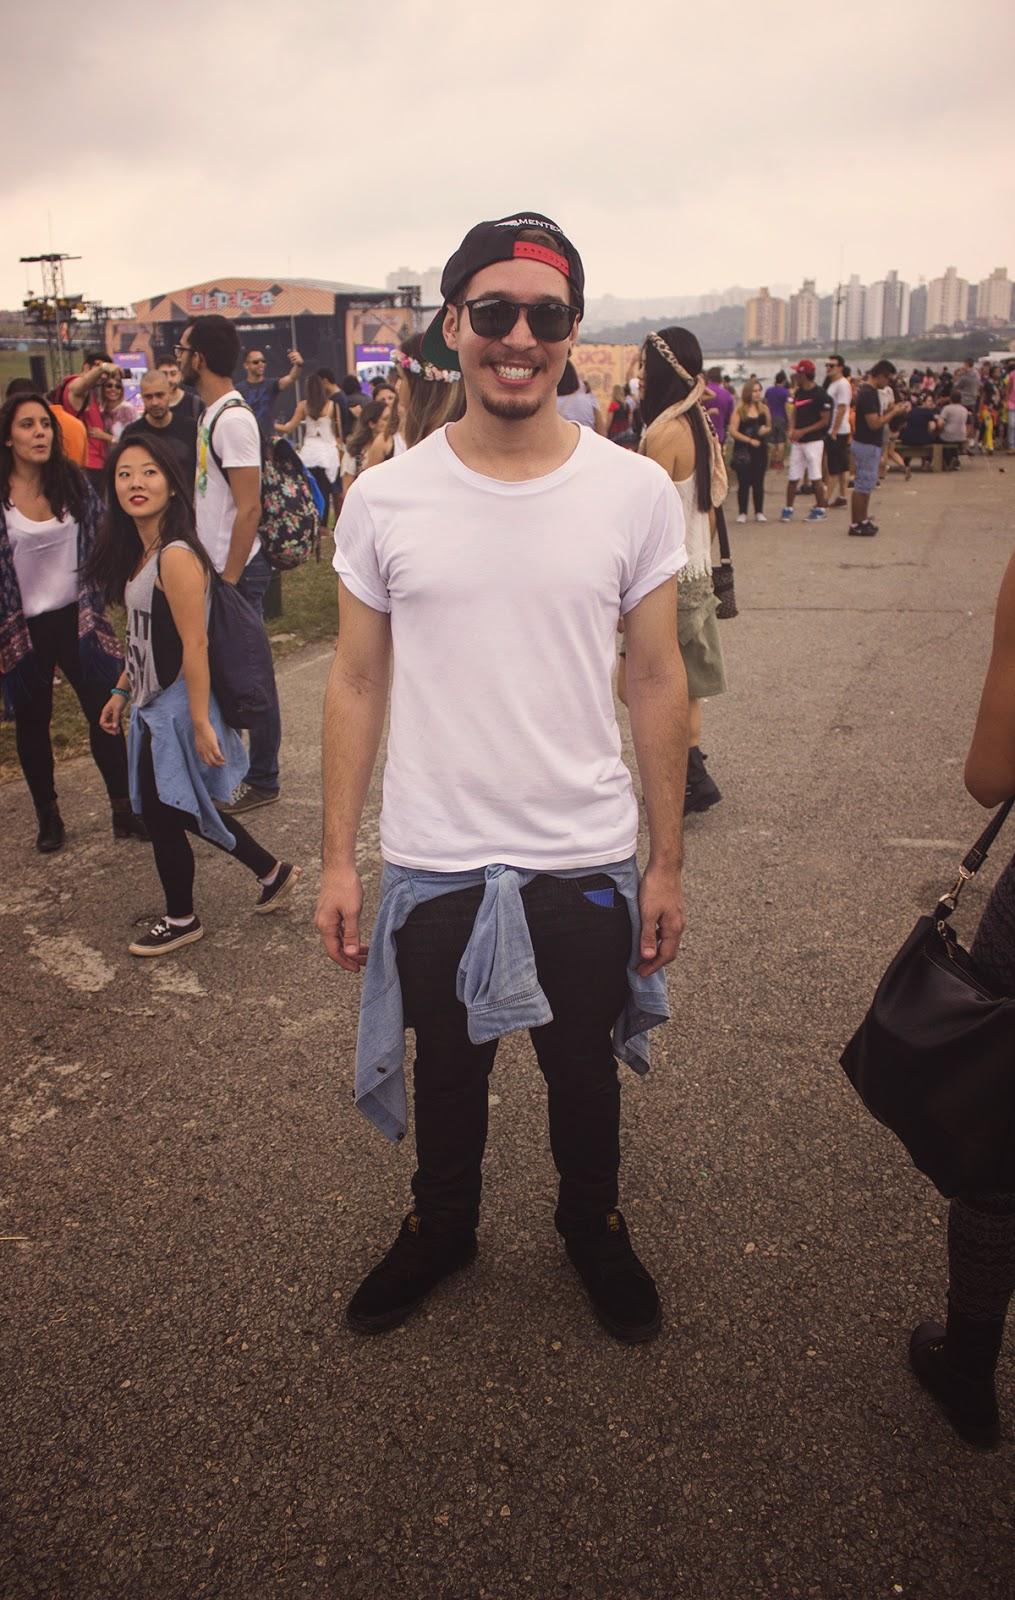 a12e3fa868c Macho Moda - Blog de Moda Masculina  Os Looks Masculinos do LollaPalooza  Brasil 2015!